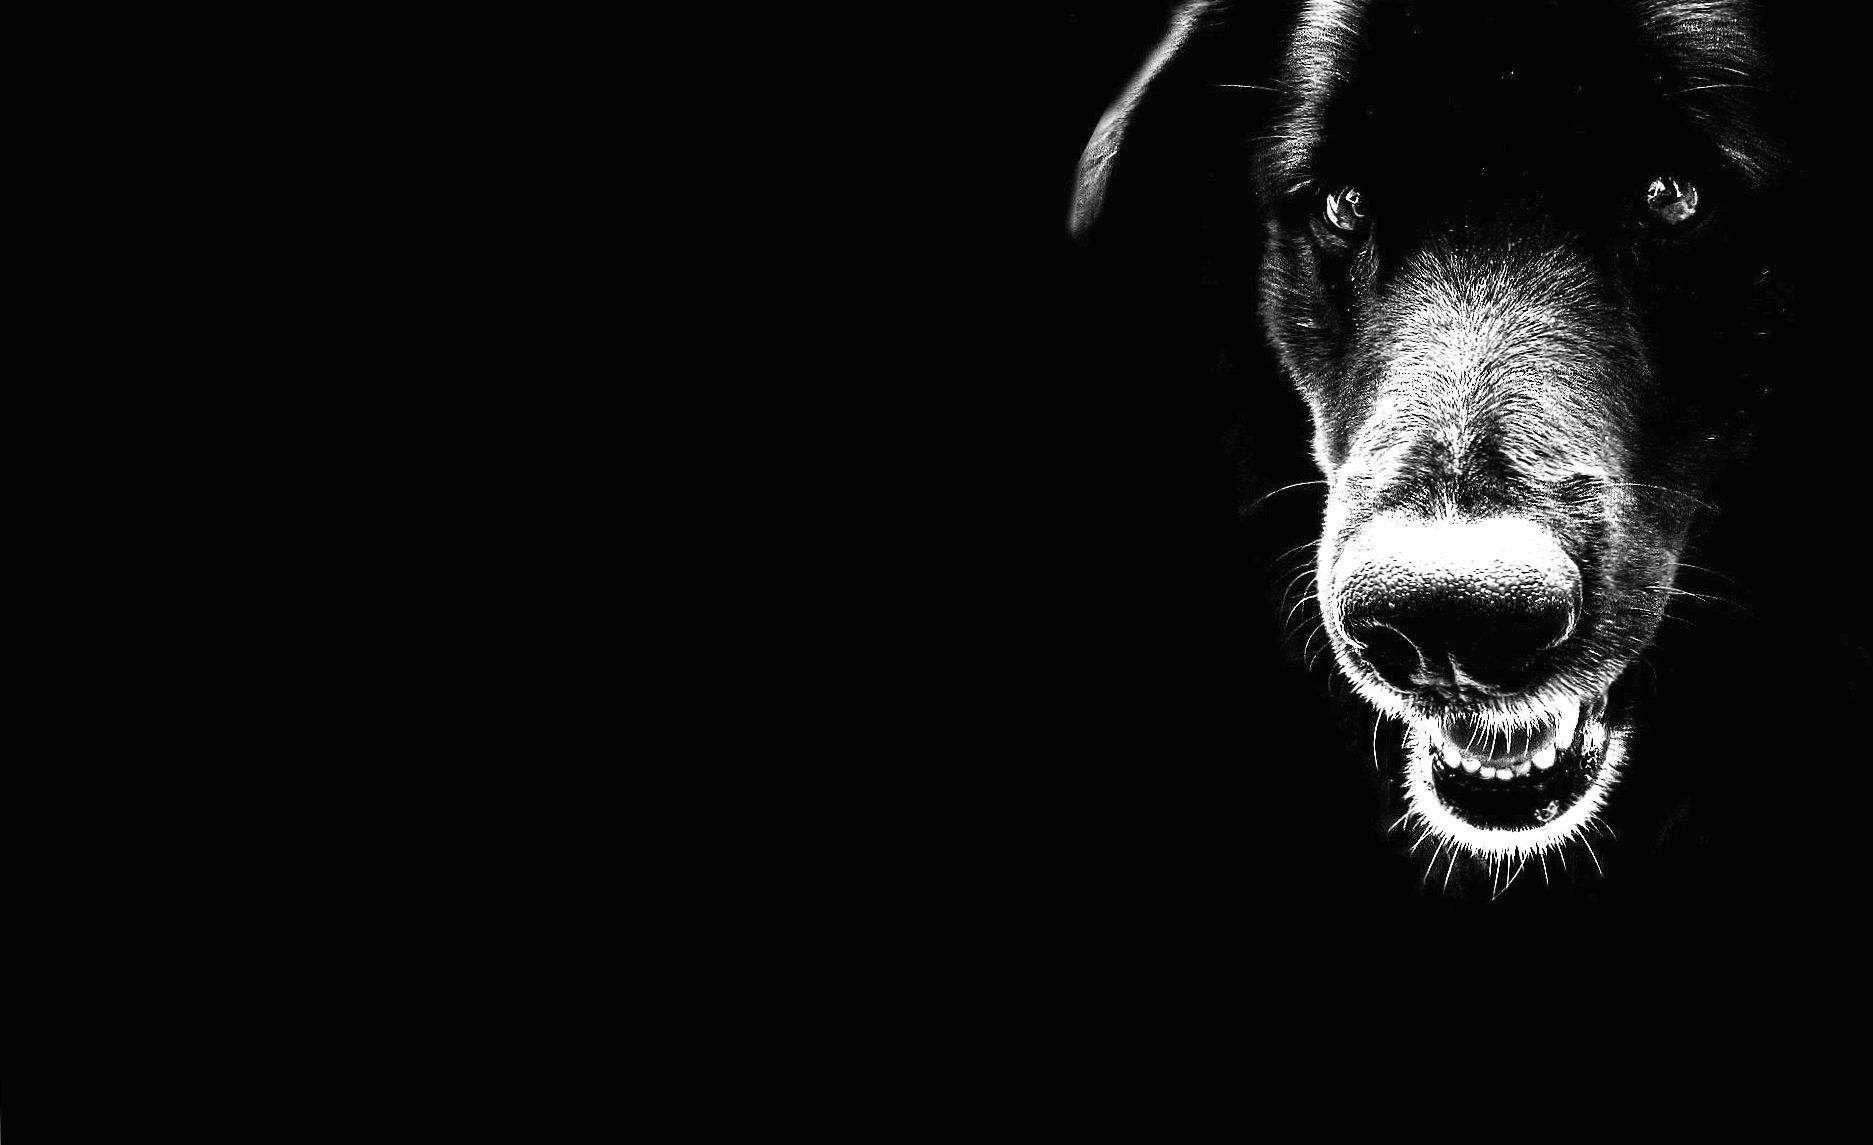 Black dog wallpapers HD quality